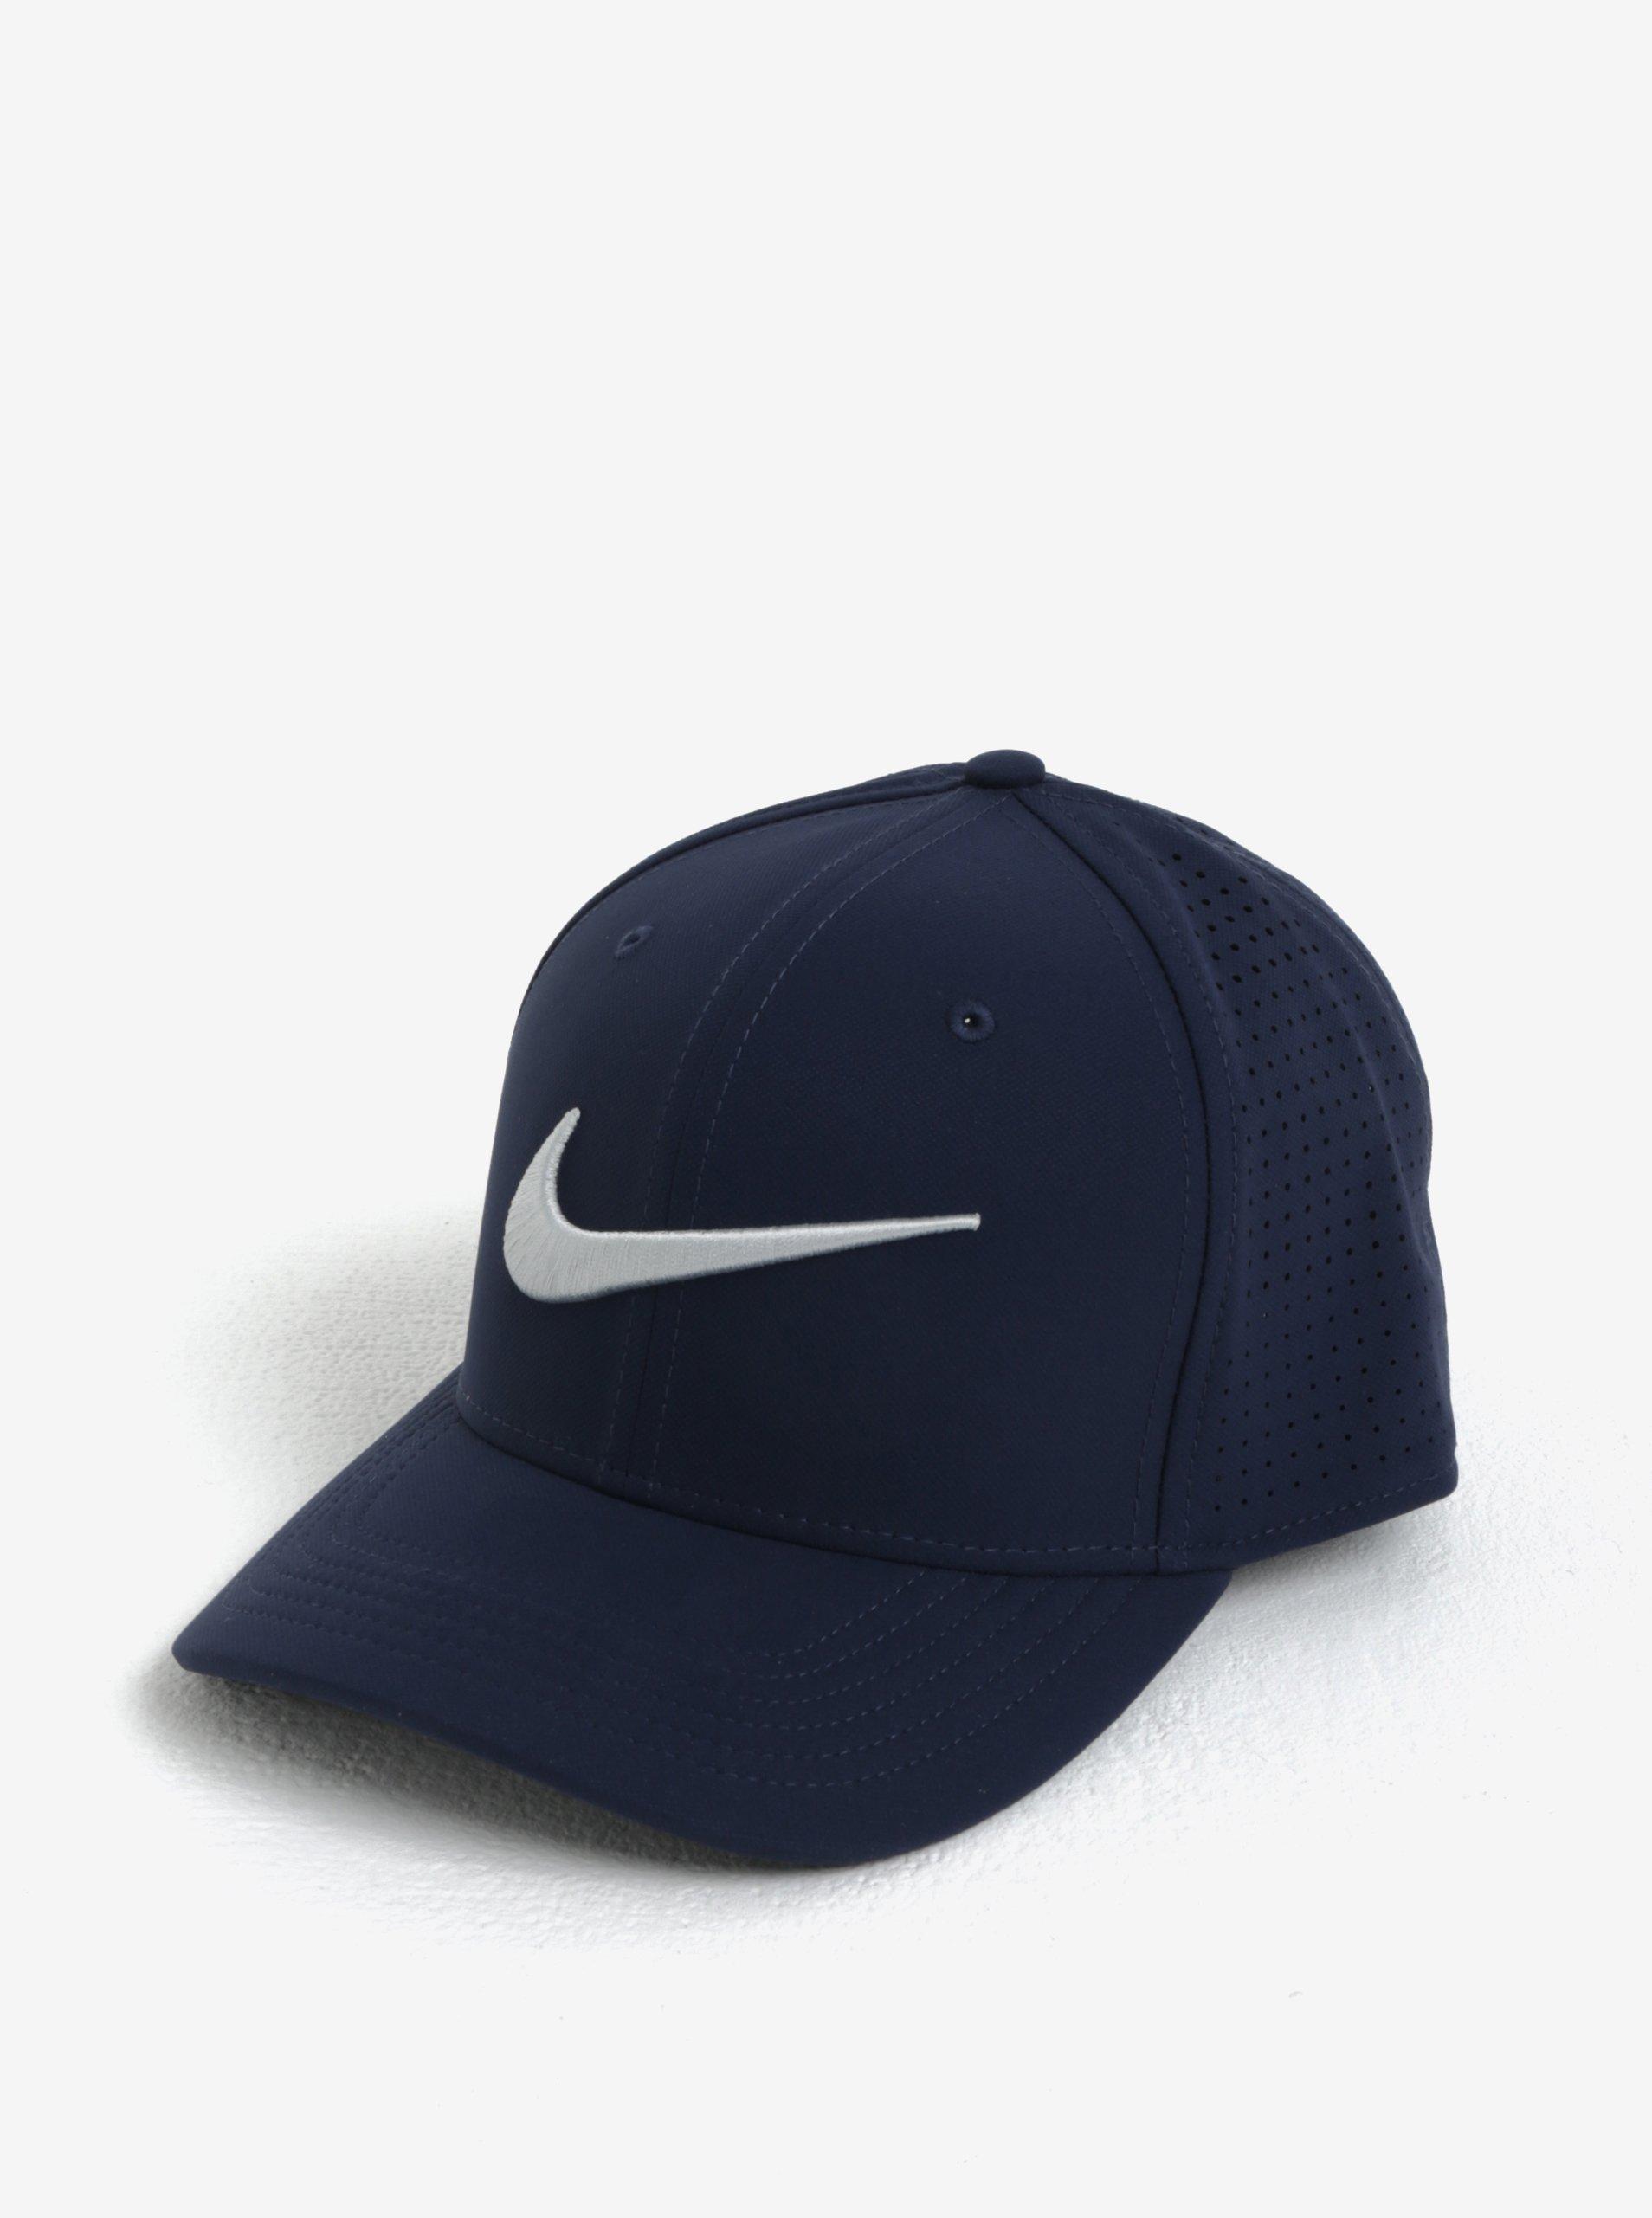 43b996208 Tmavomodrá unisex funkčná šiltovka Nike